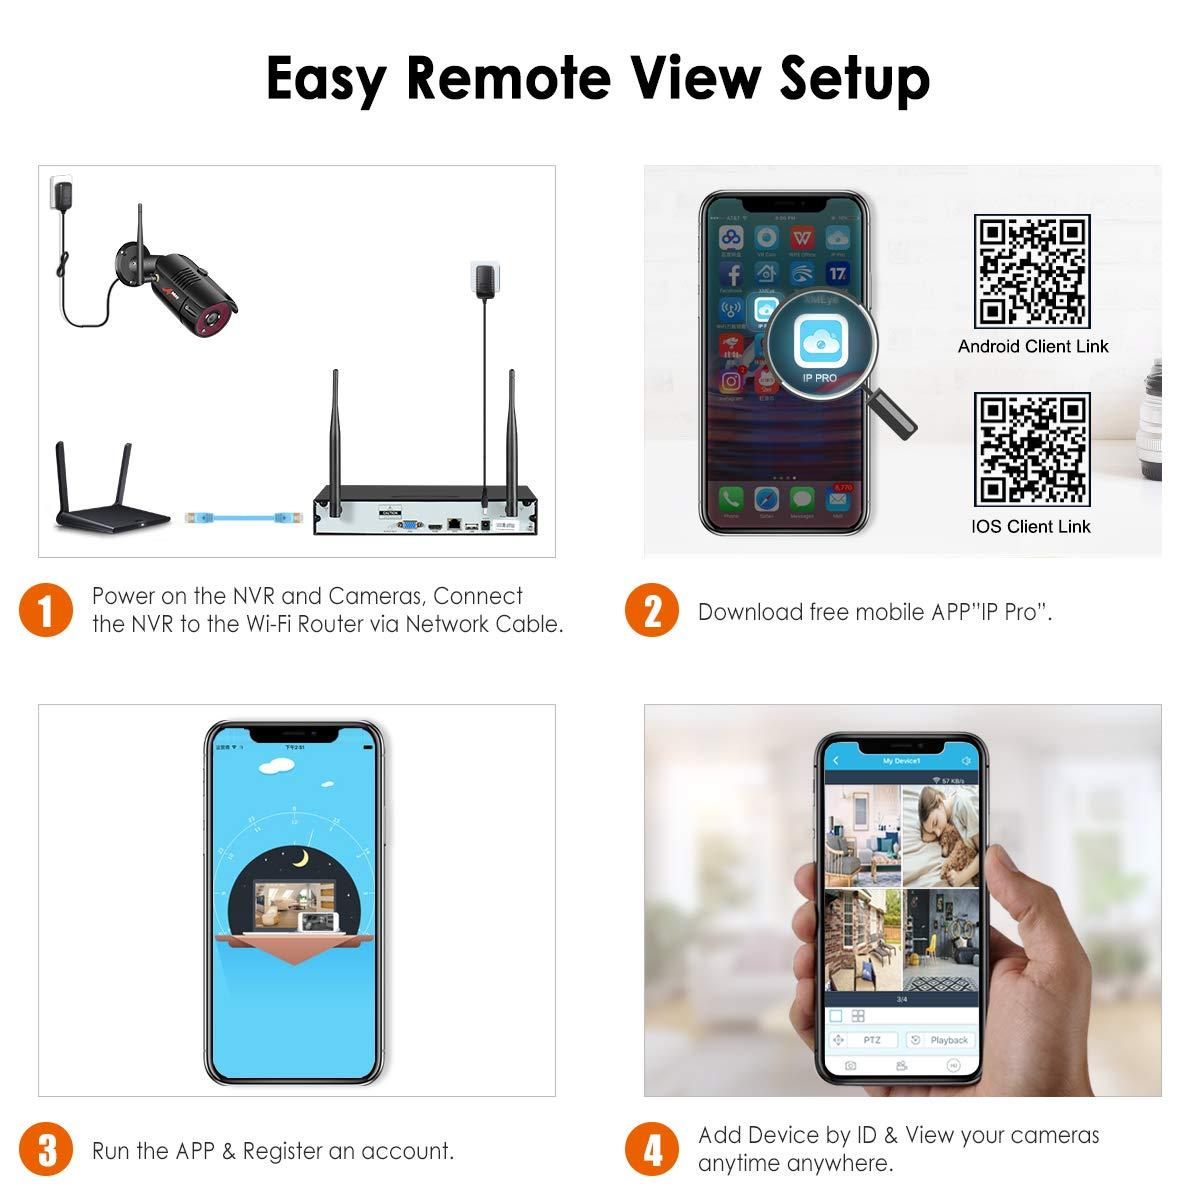 4CH 1080P HD NVR Outdoor Surveillance System – ANRAN